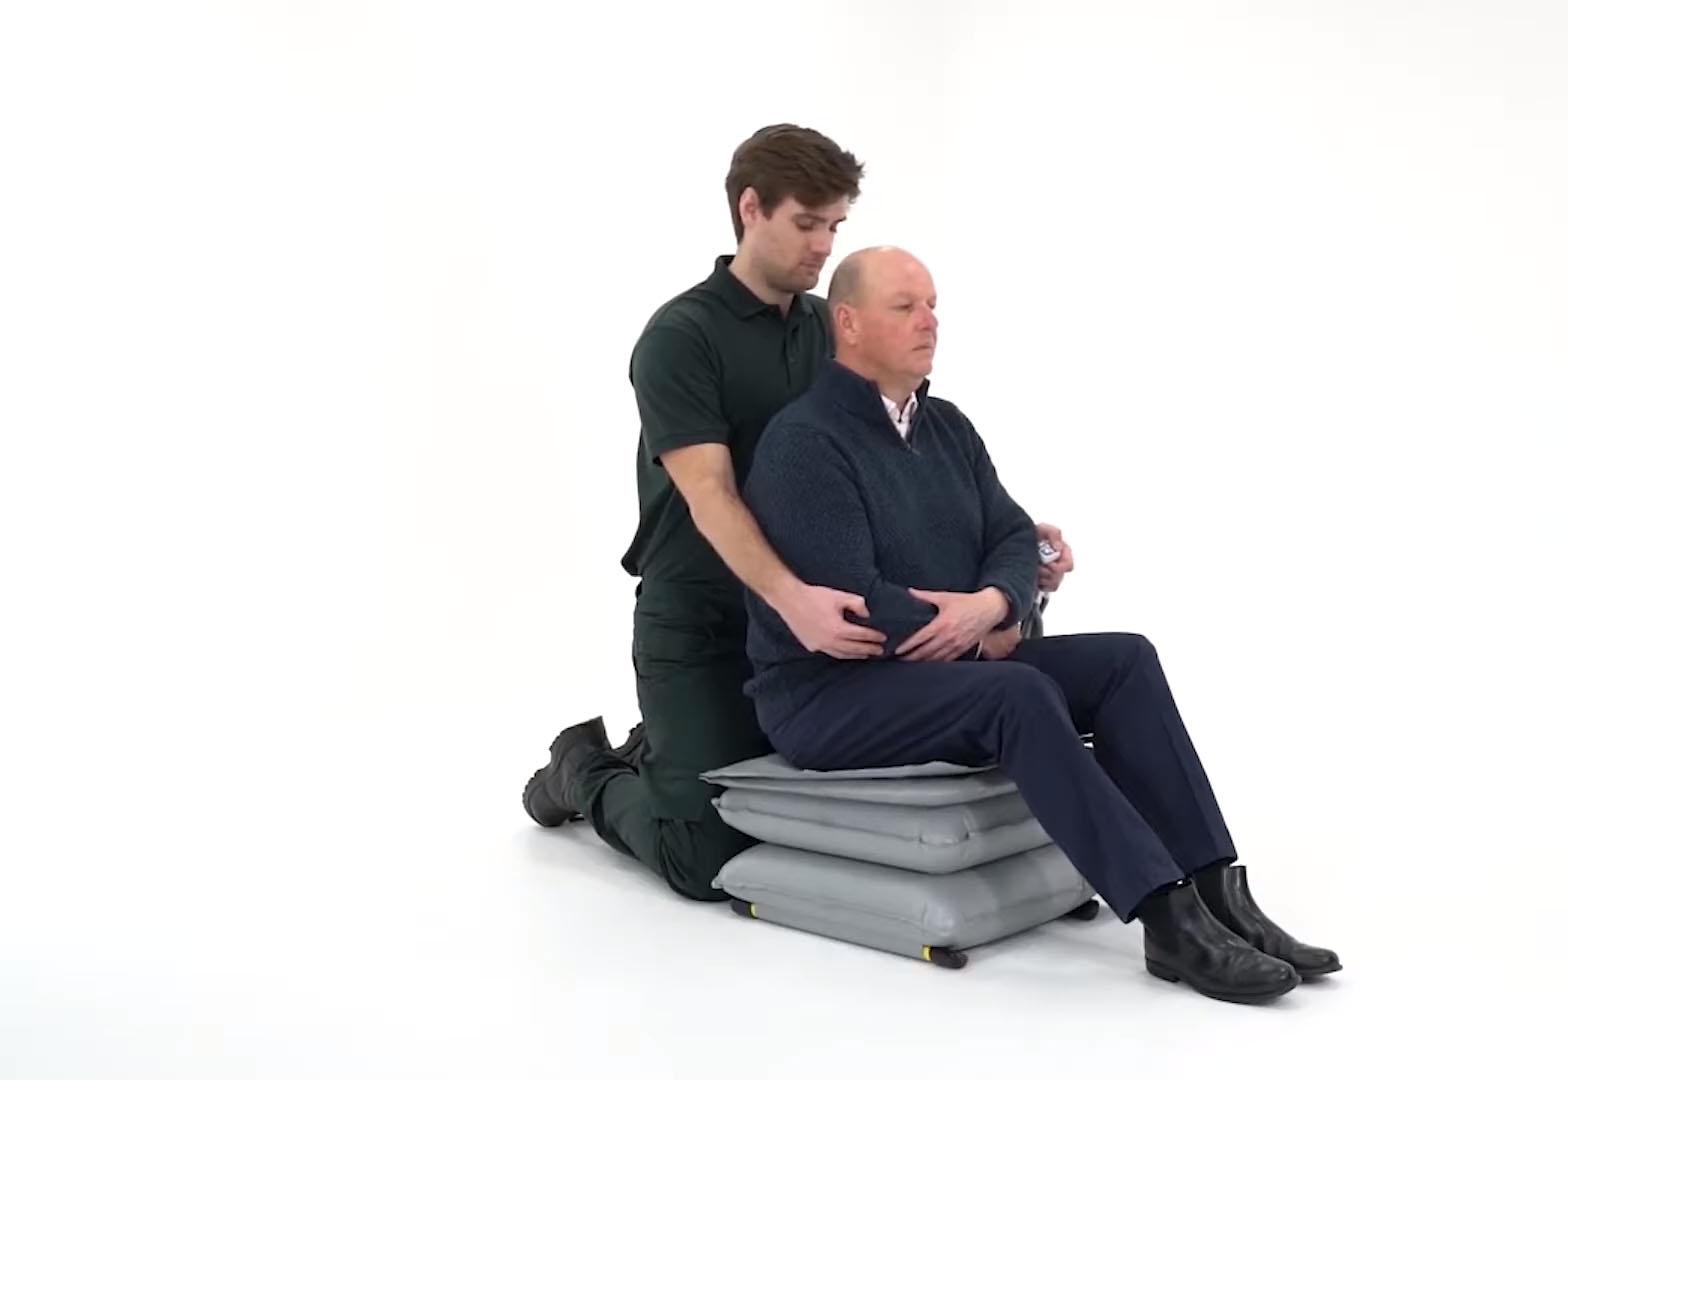 ELK Lifting Cushion